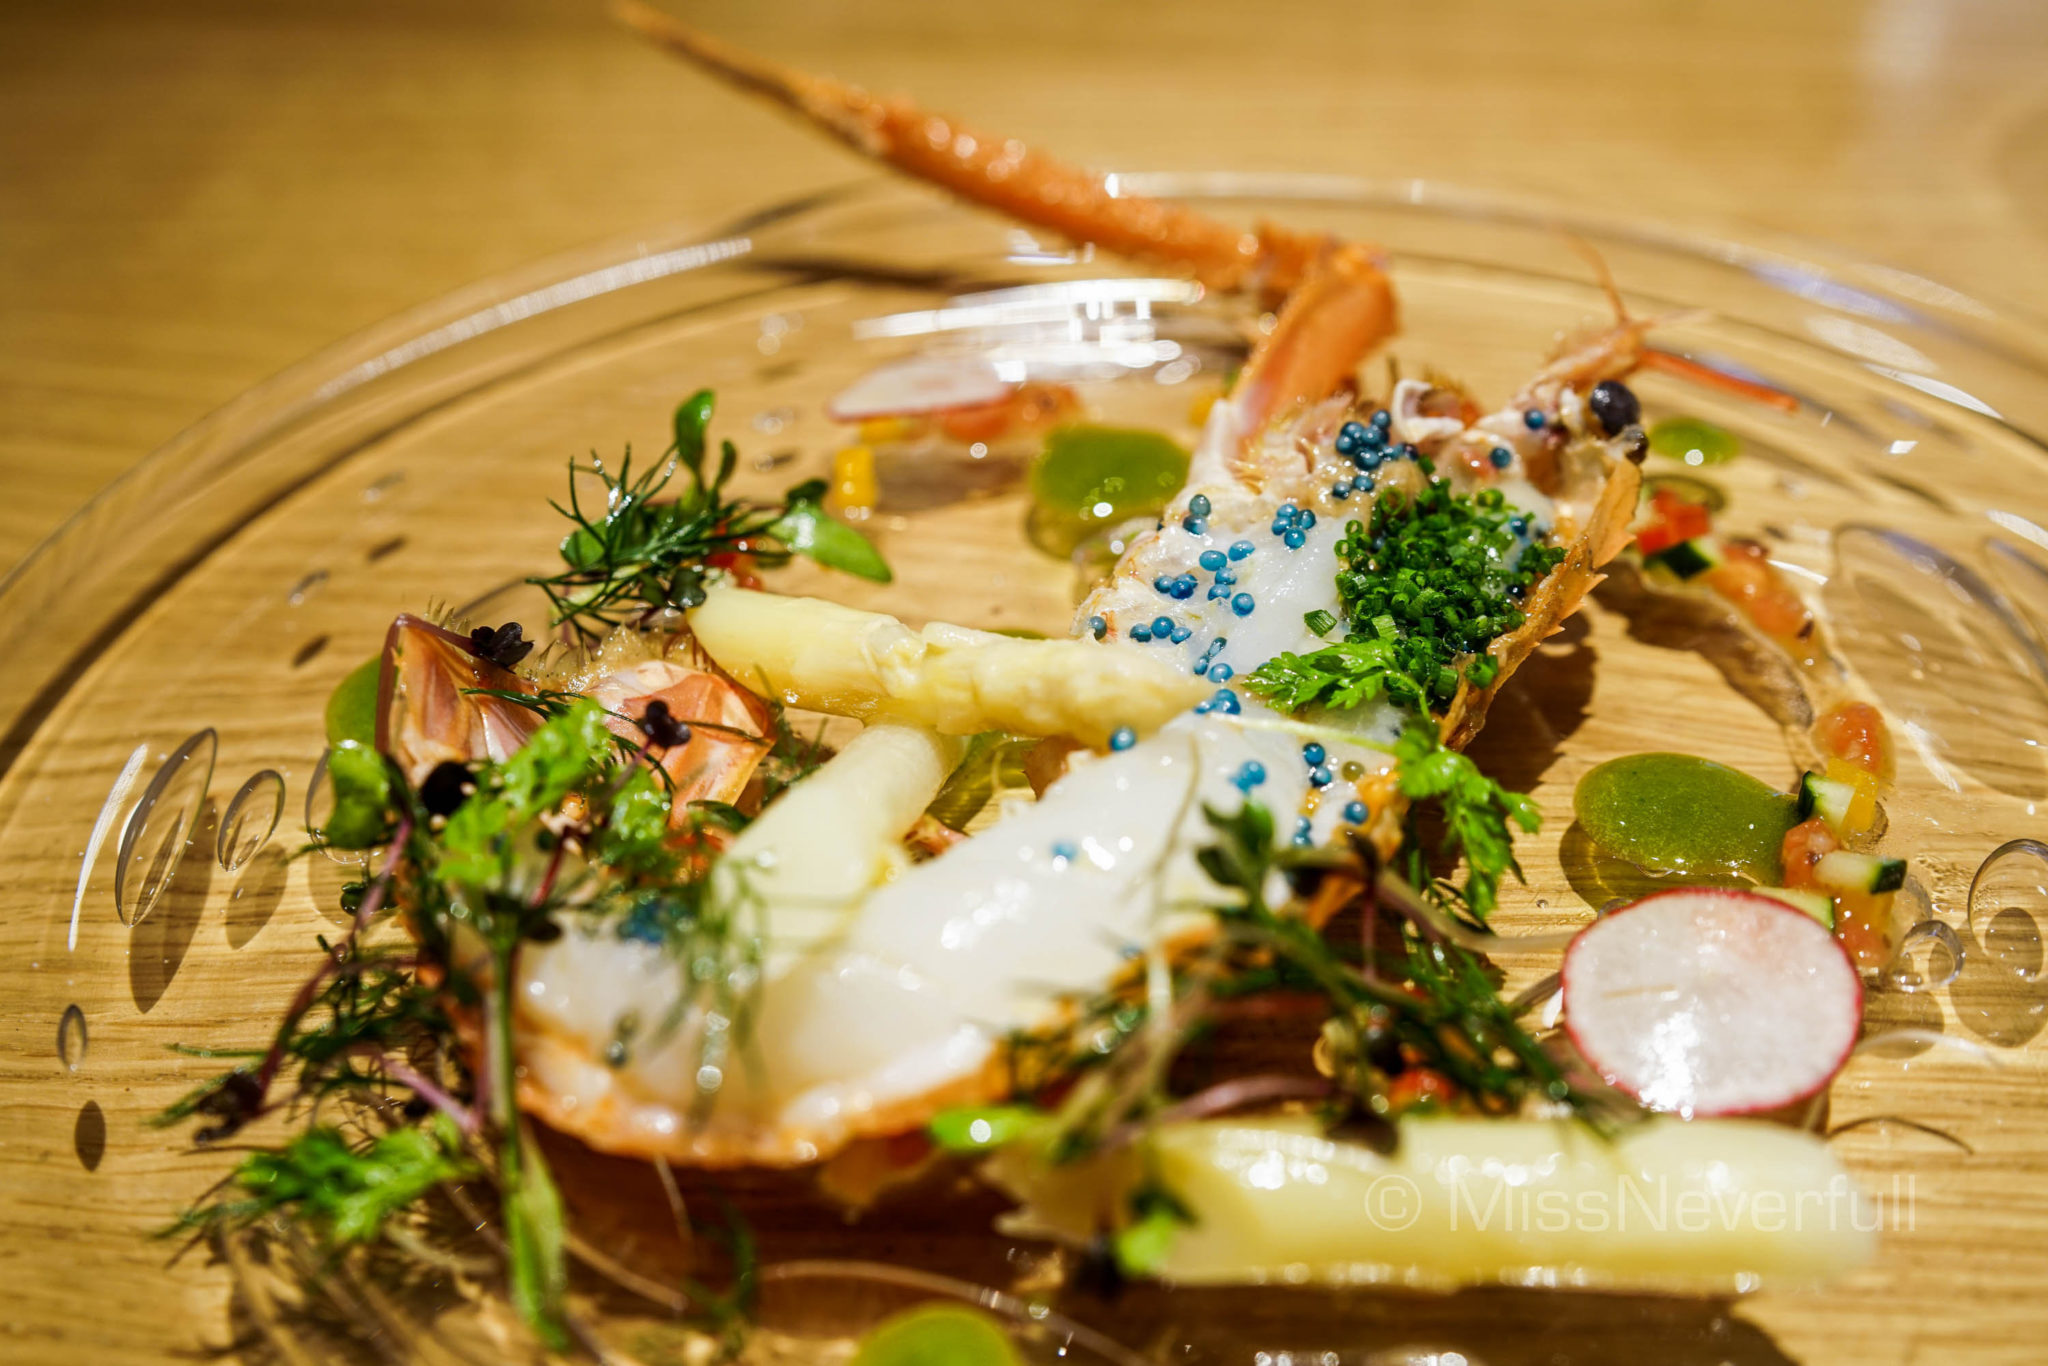 Shizuoka Scampi, white asparagus, tomato puree, lobster caviar